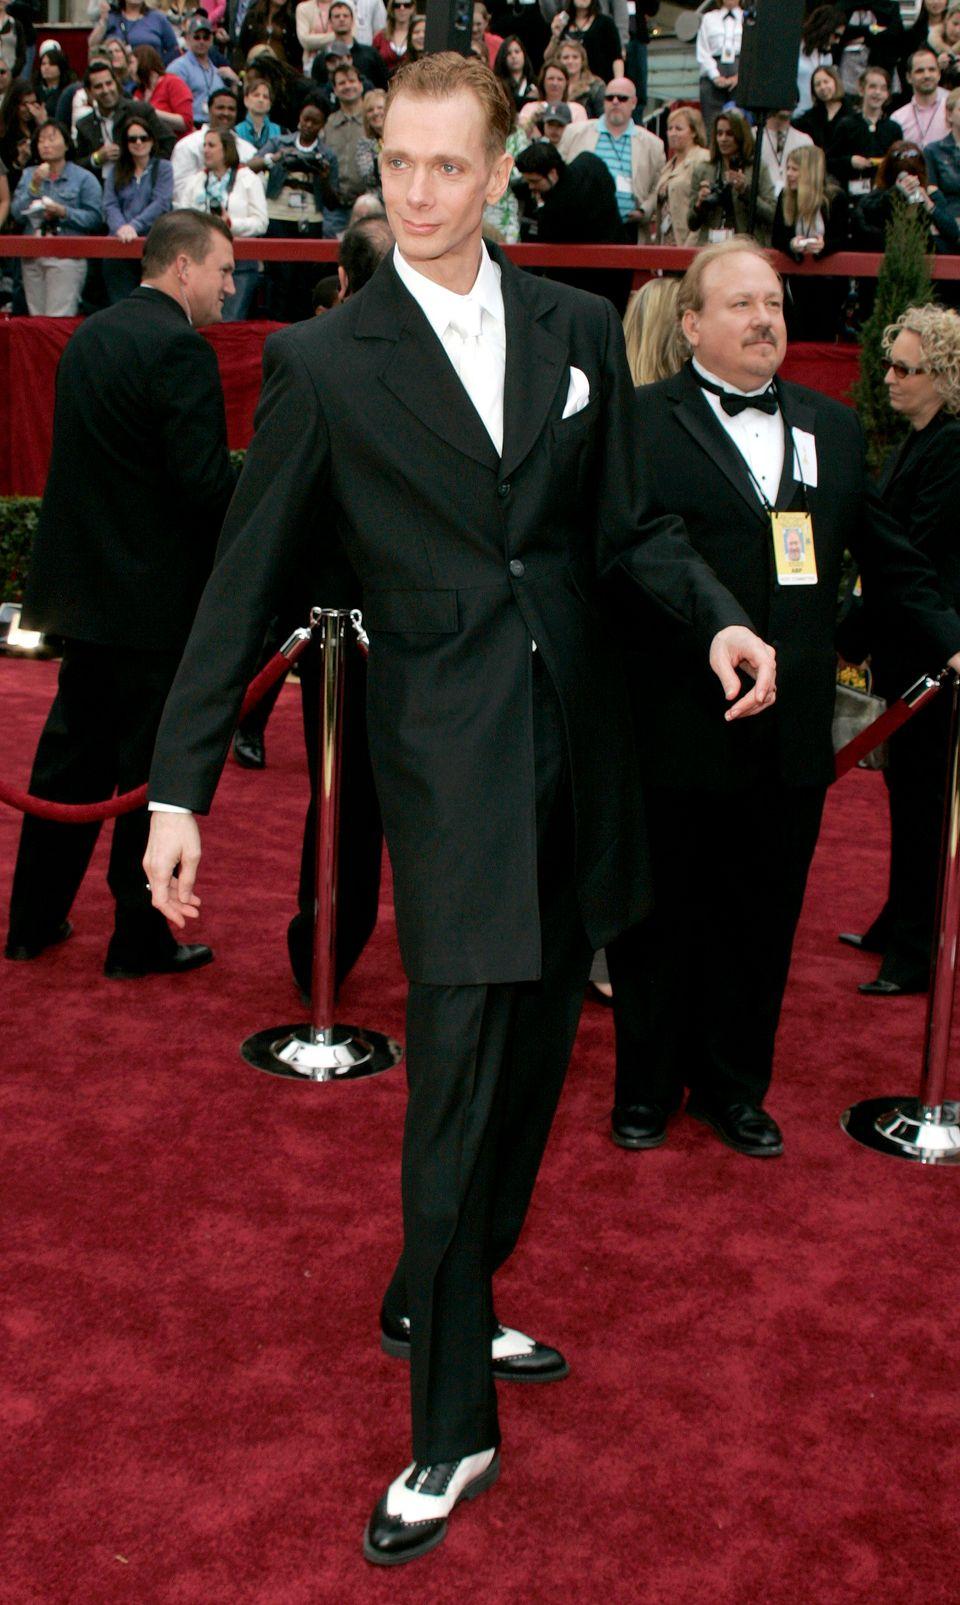 Doug Jones attends the Oscars on Feb. 25, 2007.